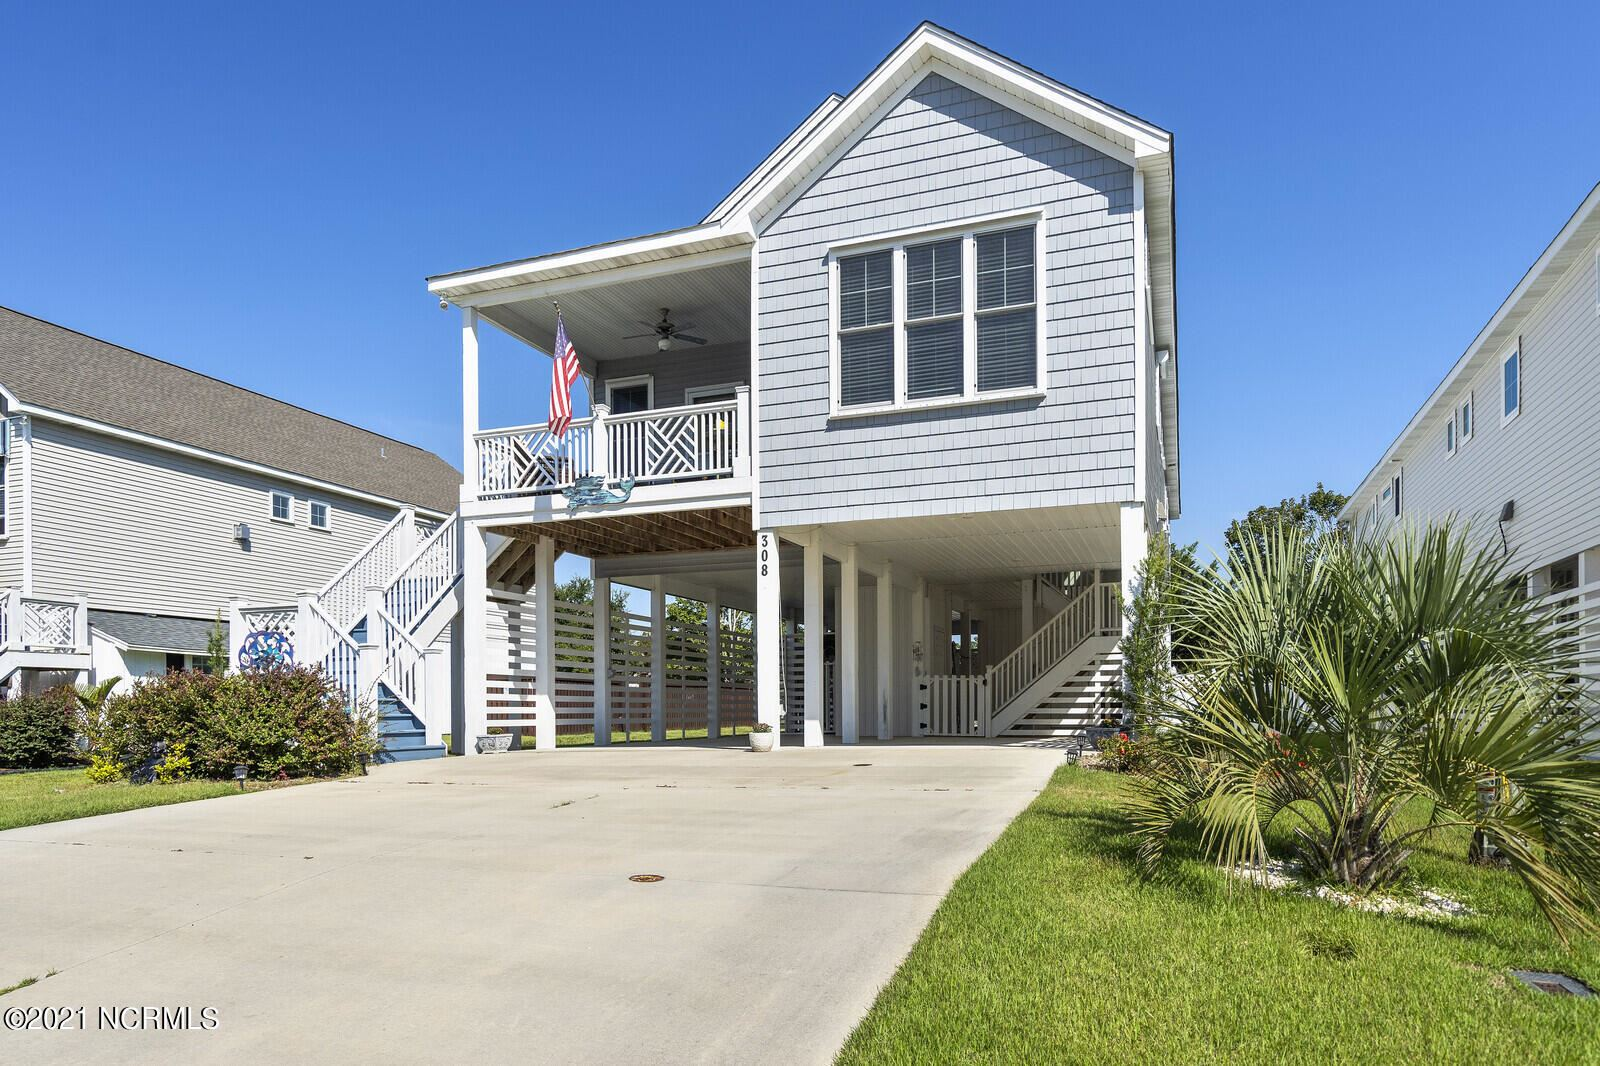 Photo of 308 Ivy Lane, Carolina Beach, NC 28428 (MLS # 100292835)